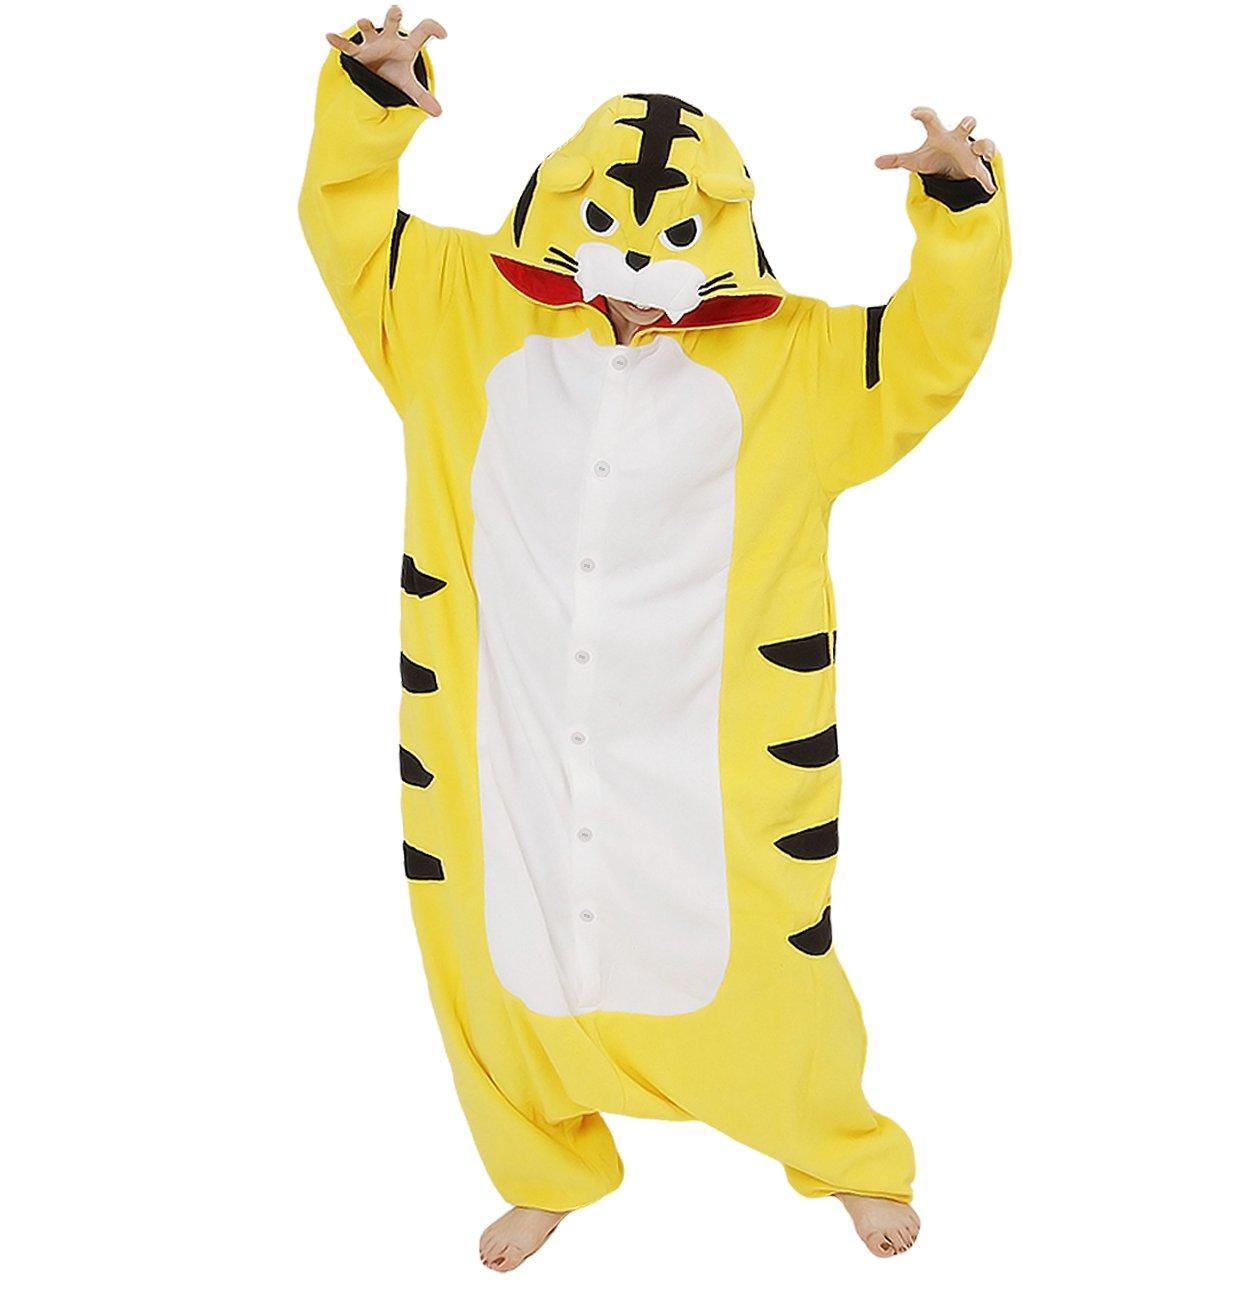 Japan Sazac Original Kigurumi Adult Pajamas Halloween Costumes